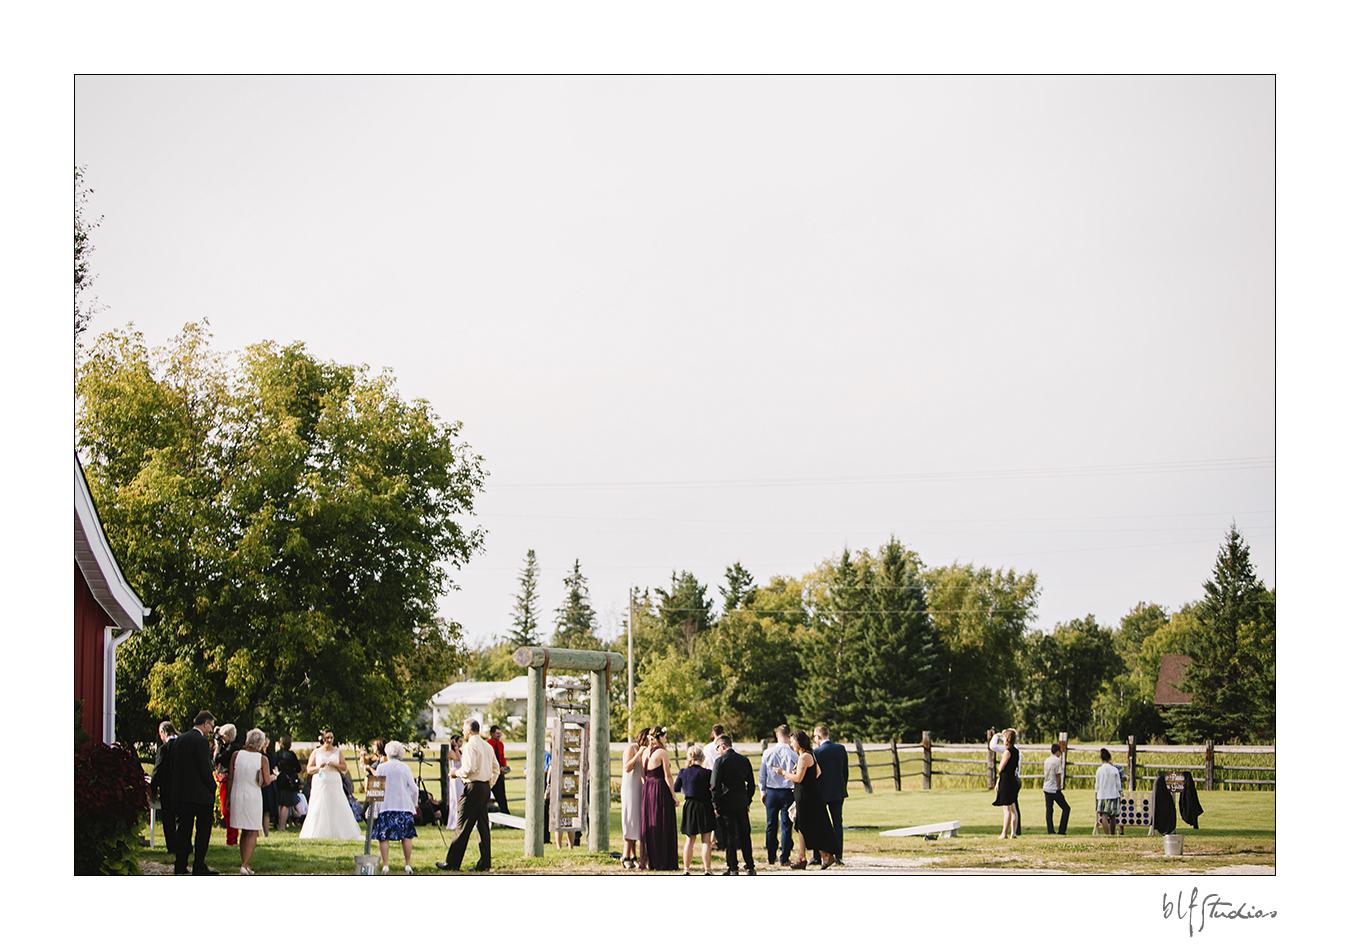 018-manitoba-rustic-barn-wedding-photos.jpg